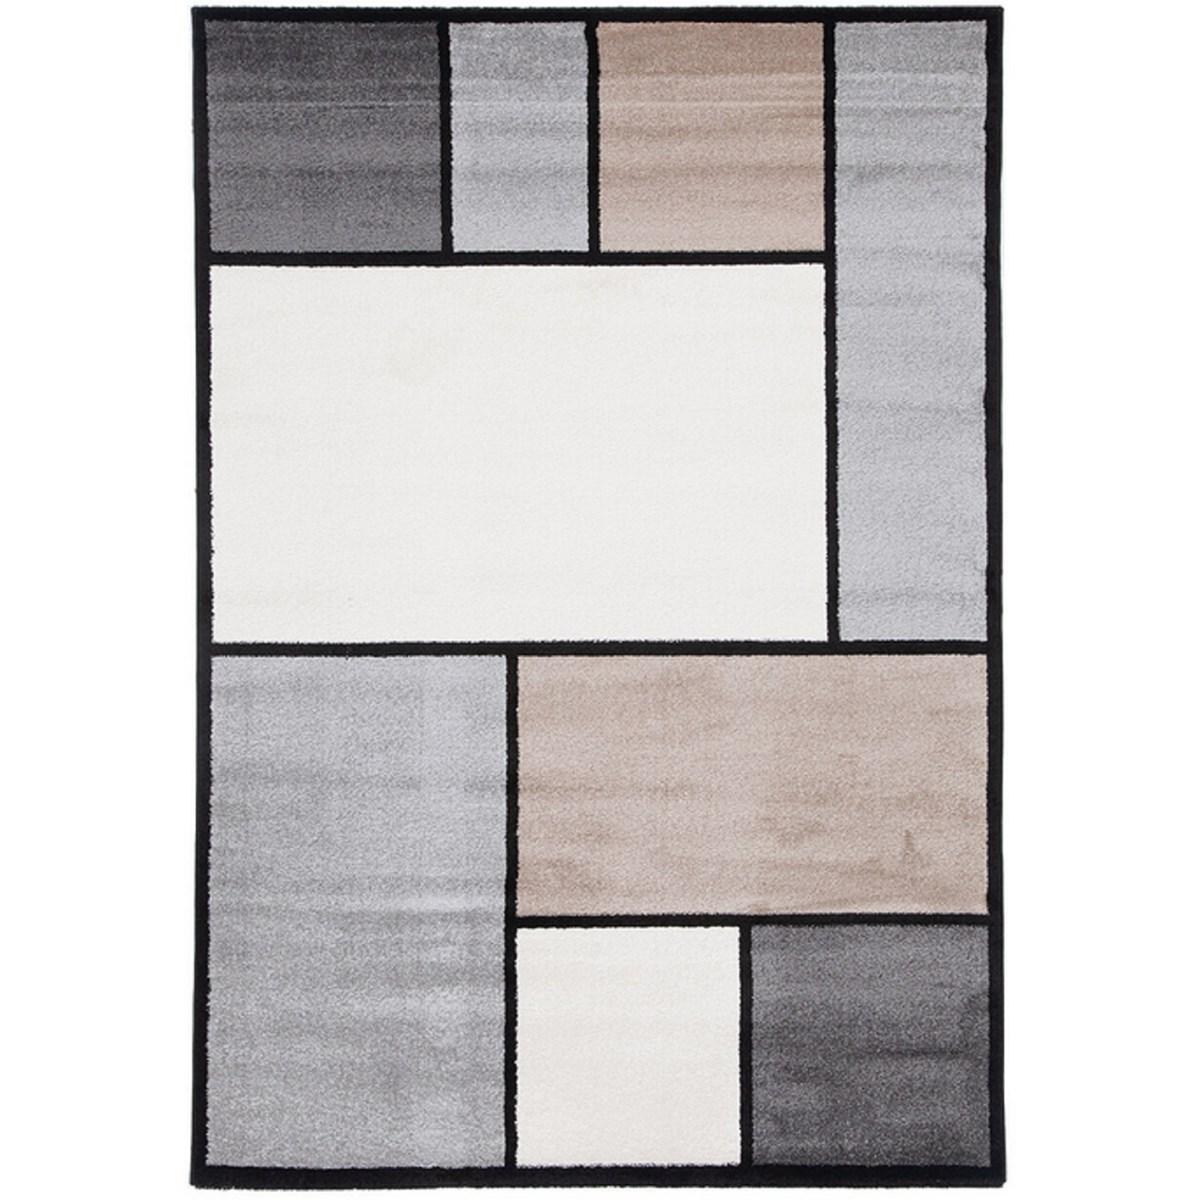 Tapis de salon en Polypropylène Beige 160x230 cm